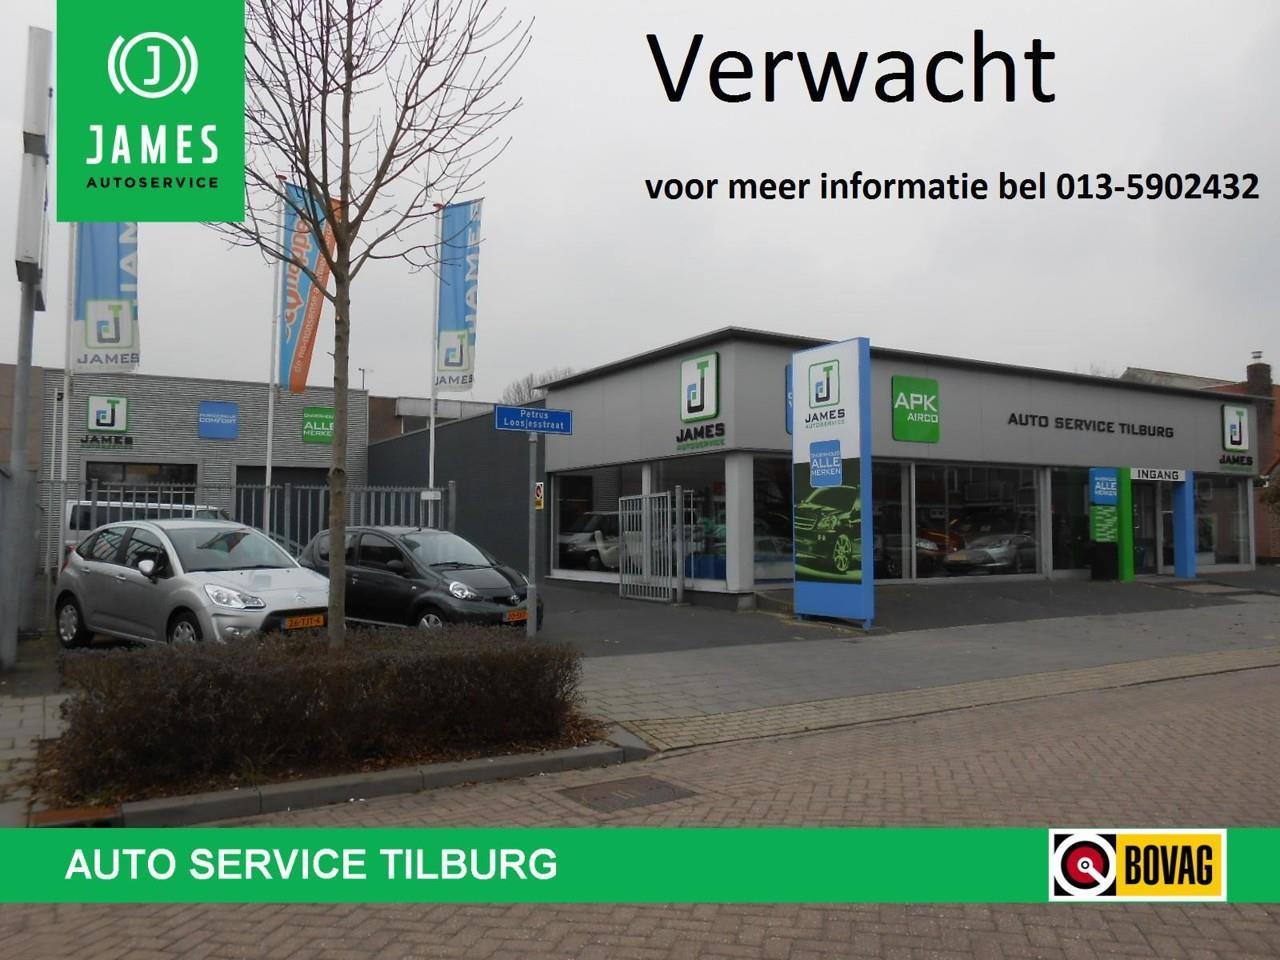 "Opel Corsa 1.4-16v turbo *100pk* blitz navi-app 16""lmv privacy-glass"